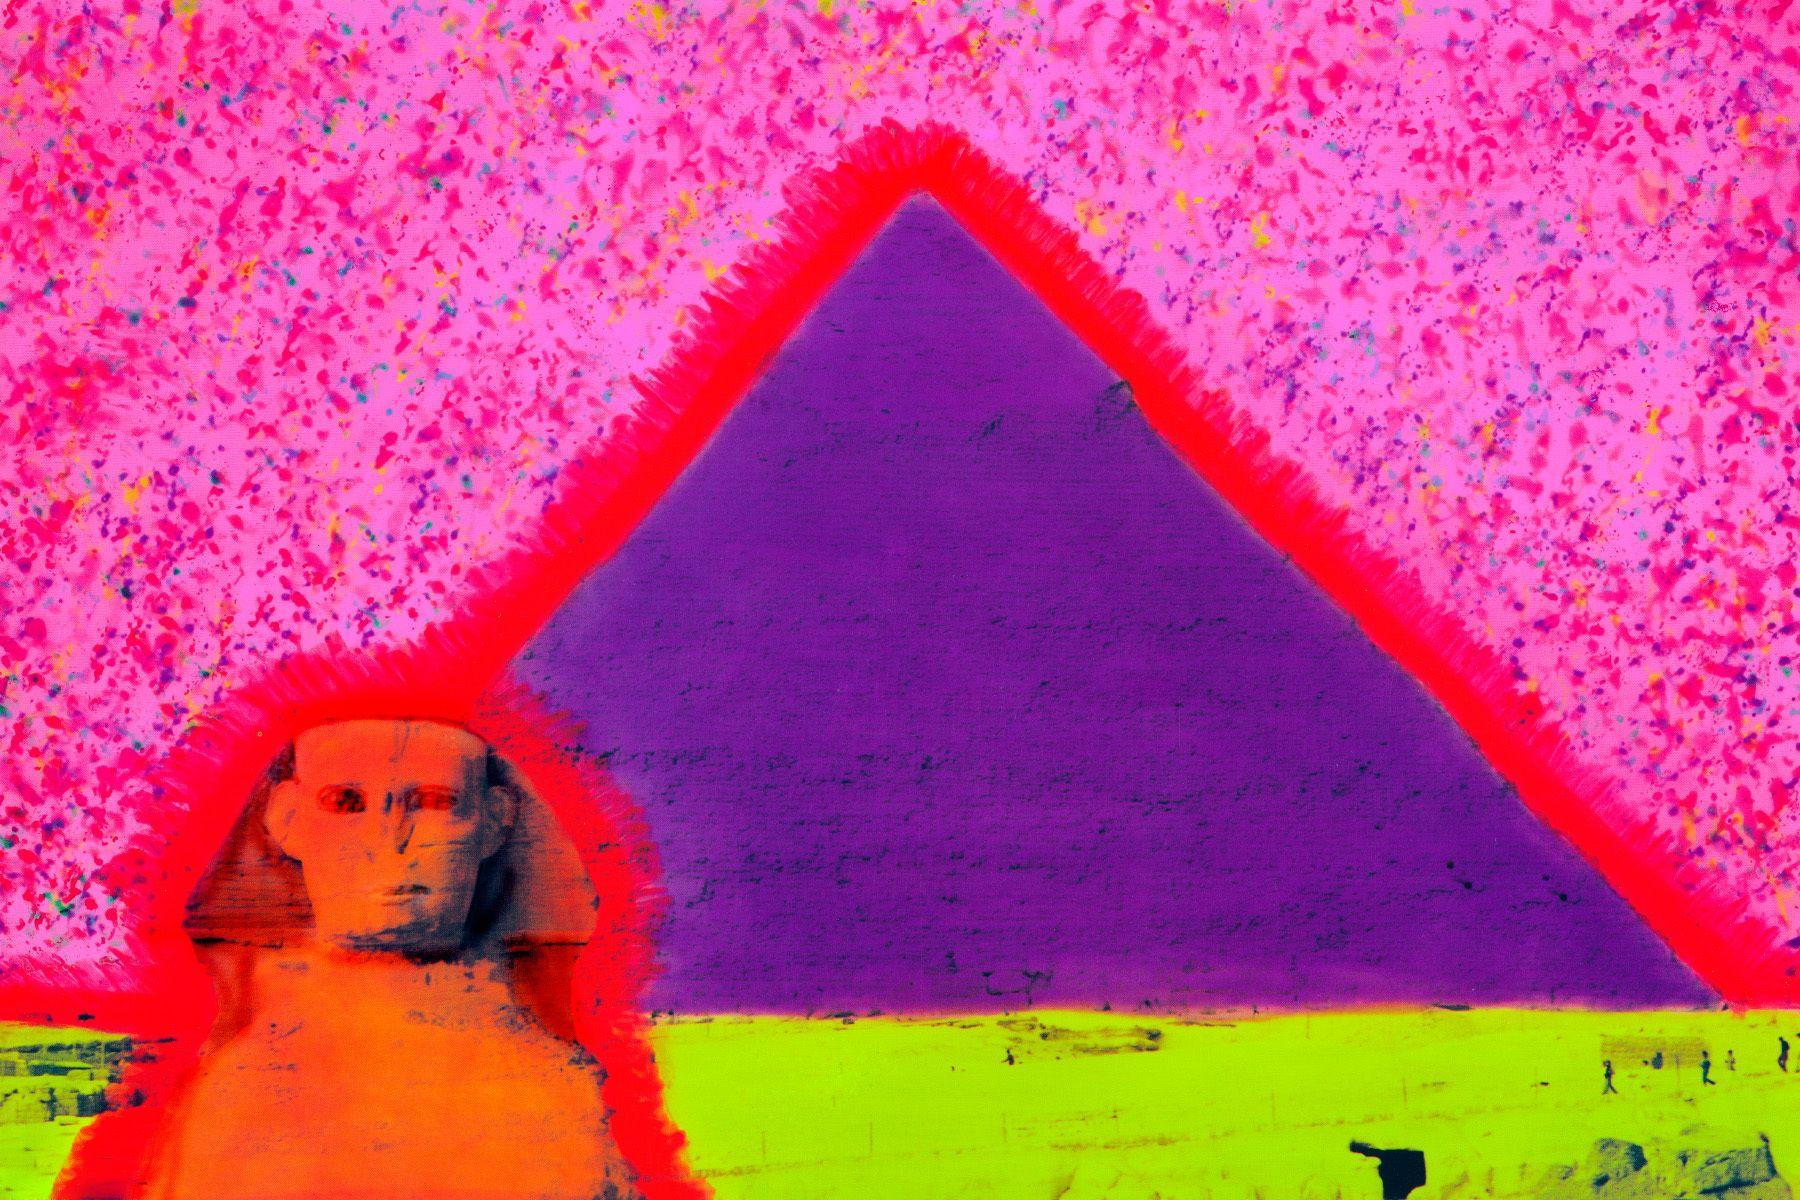 19_0_61_1d_janegottlieb_egypt_pyramid.jpg